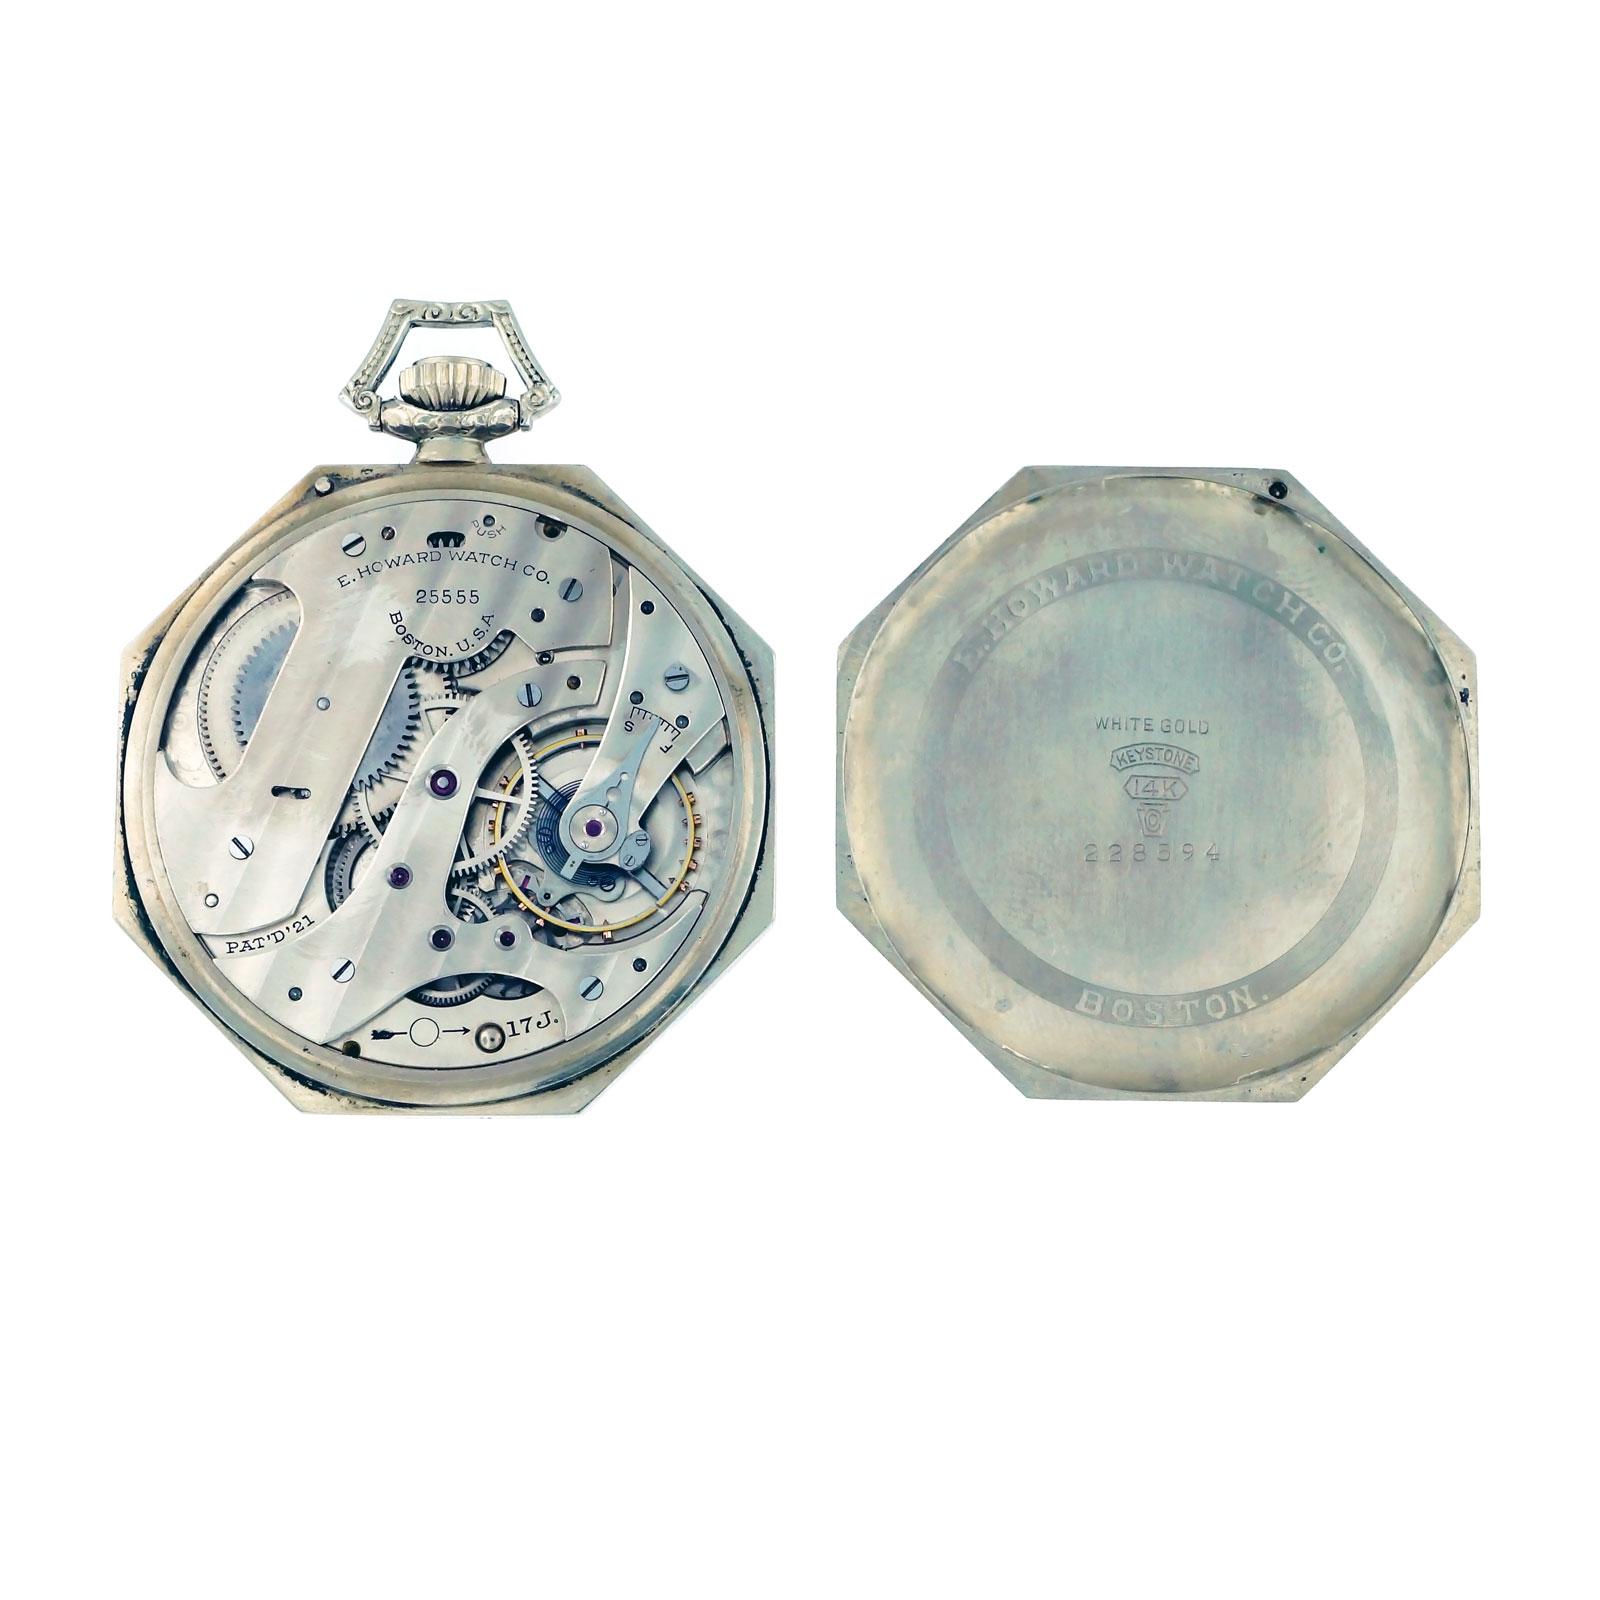 E Howard Co Octagonal 1920 14k White Gold Pocket Watch Ebay